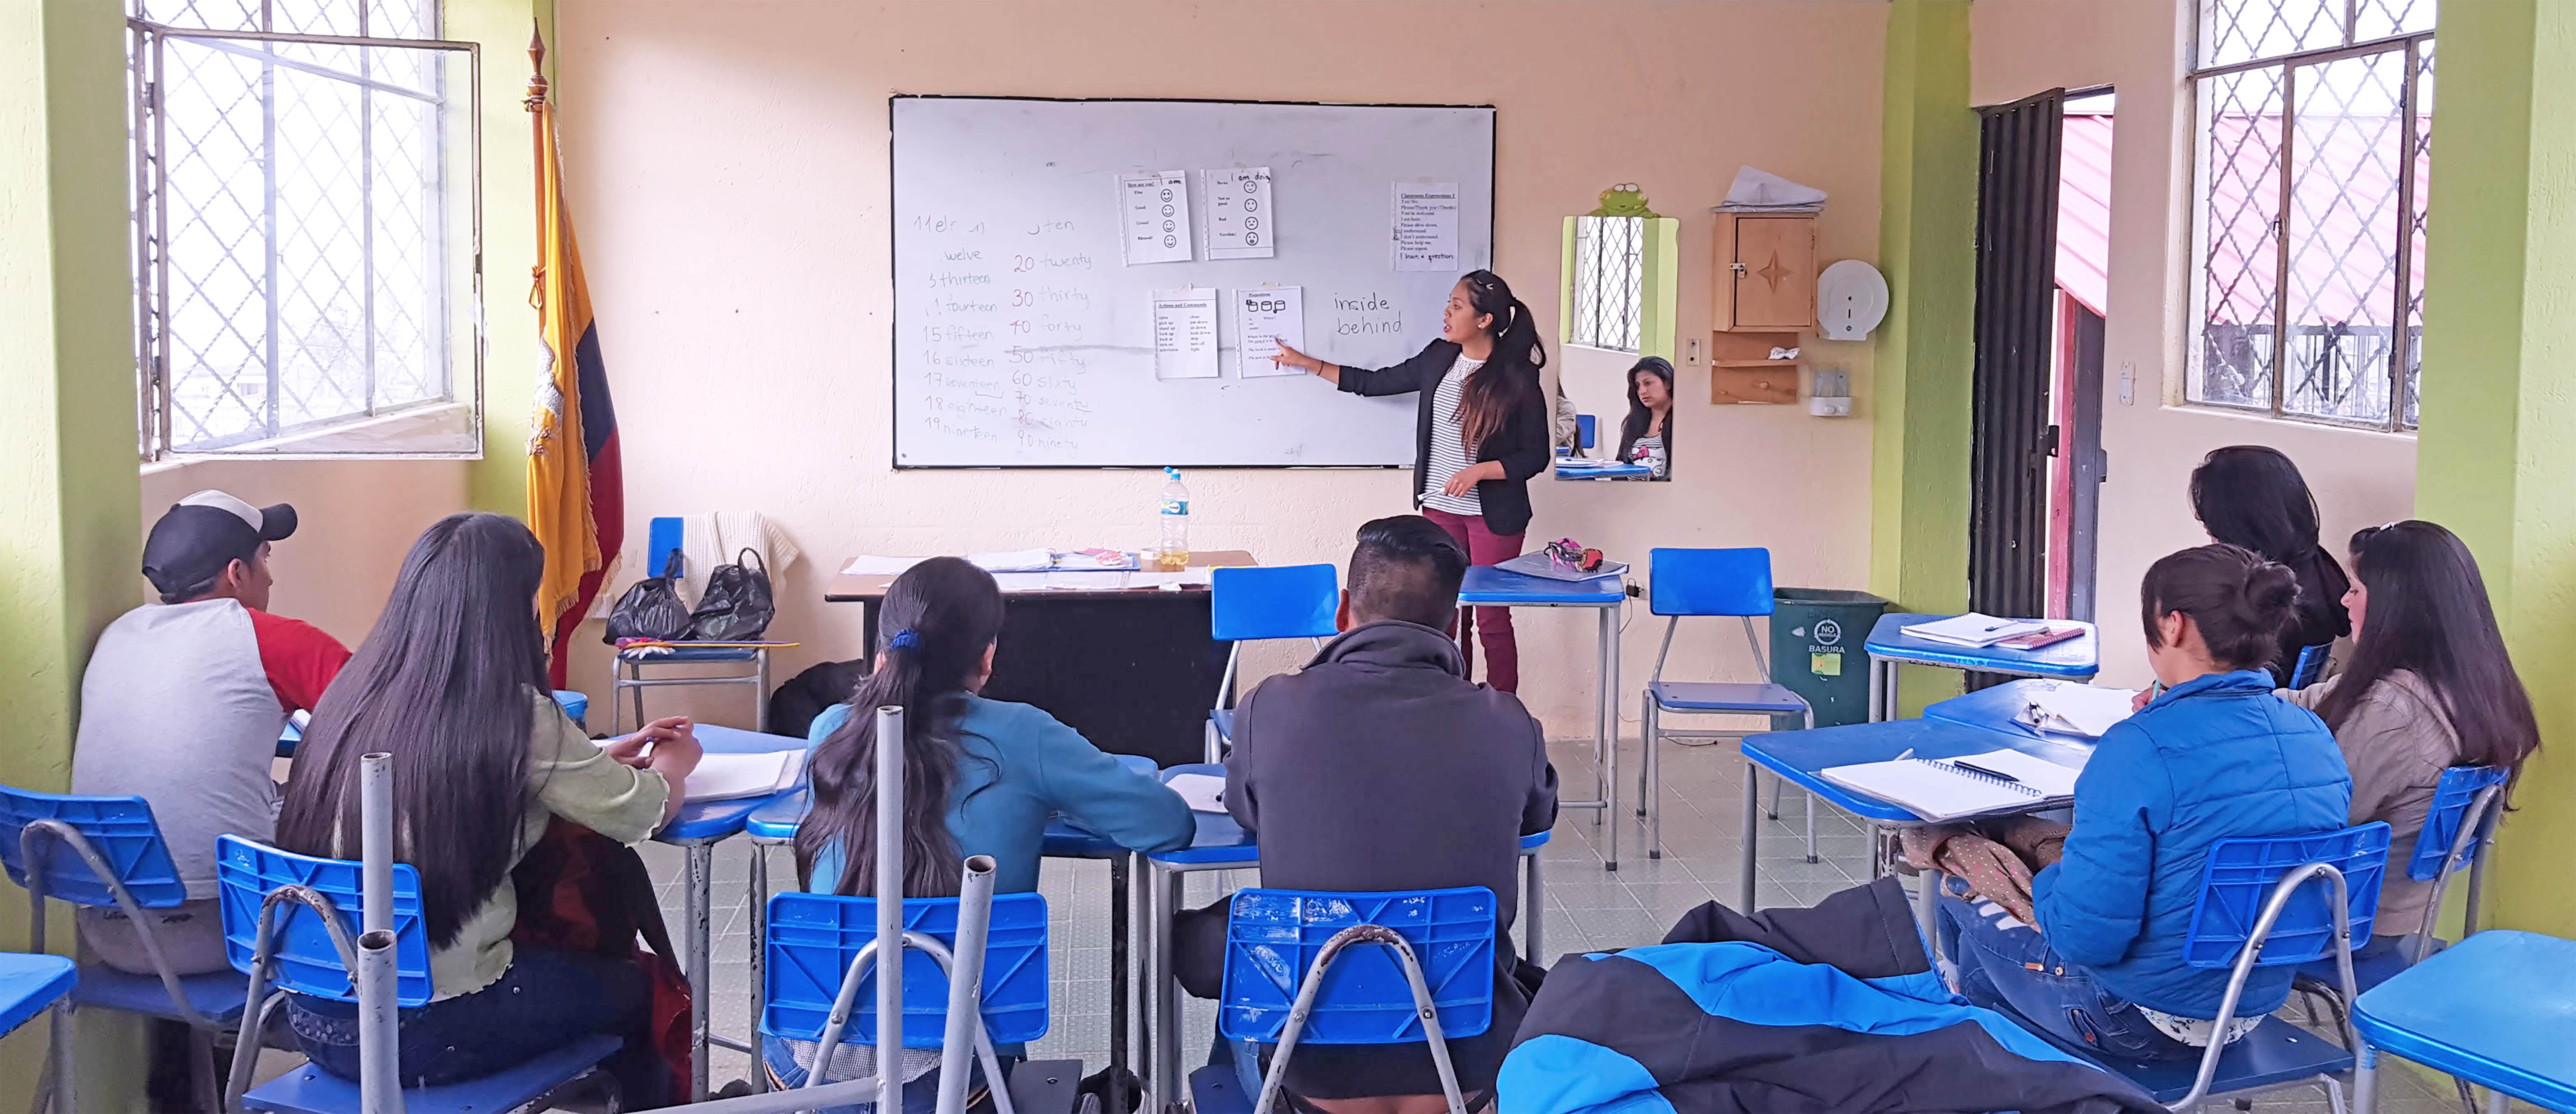 English Instruction for Community-based Tourism in Ecuador